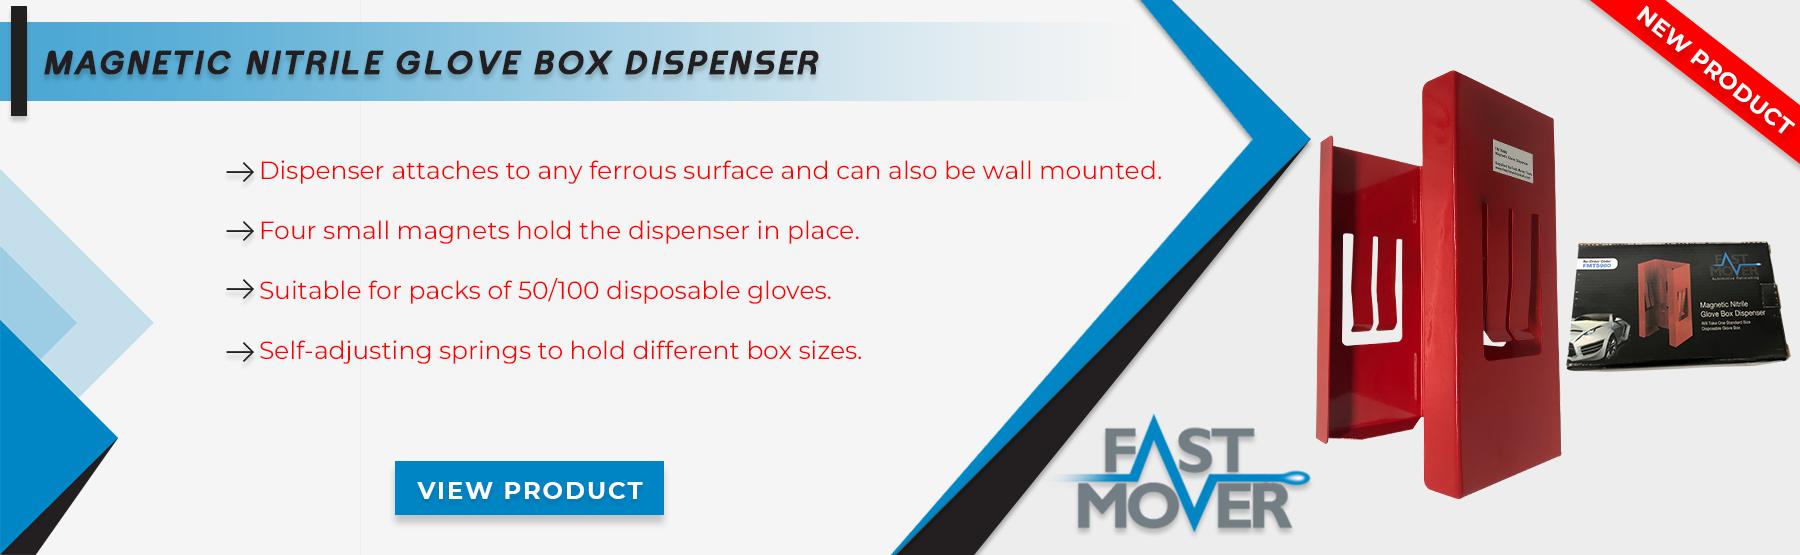 magnetic nitrile glove dispenser